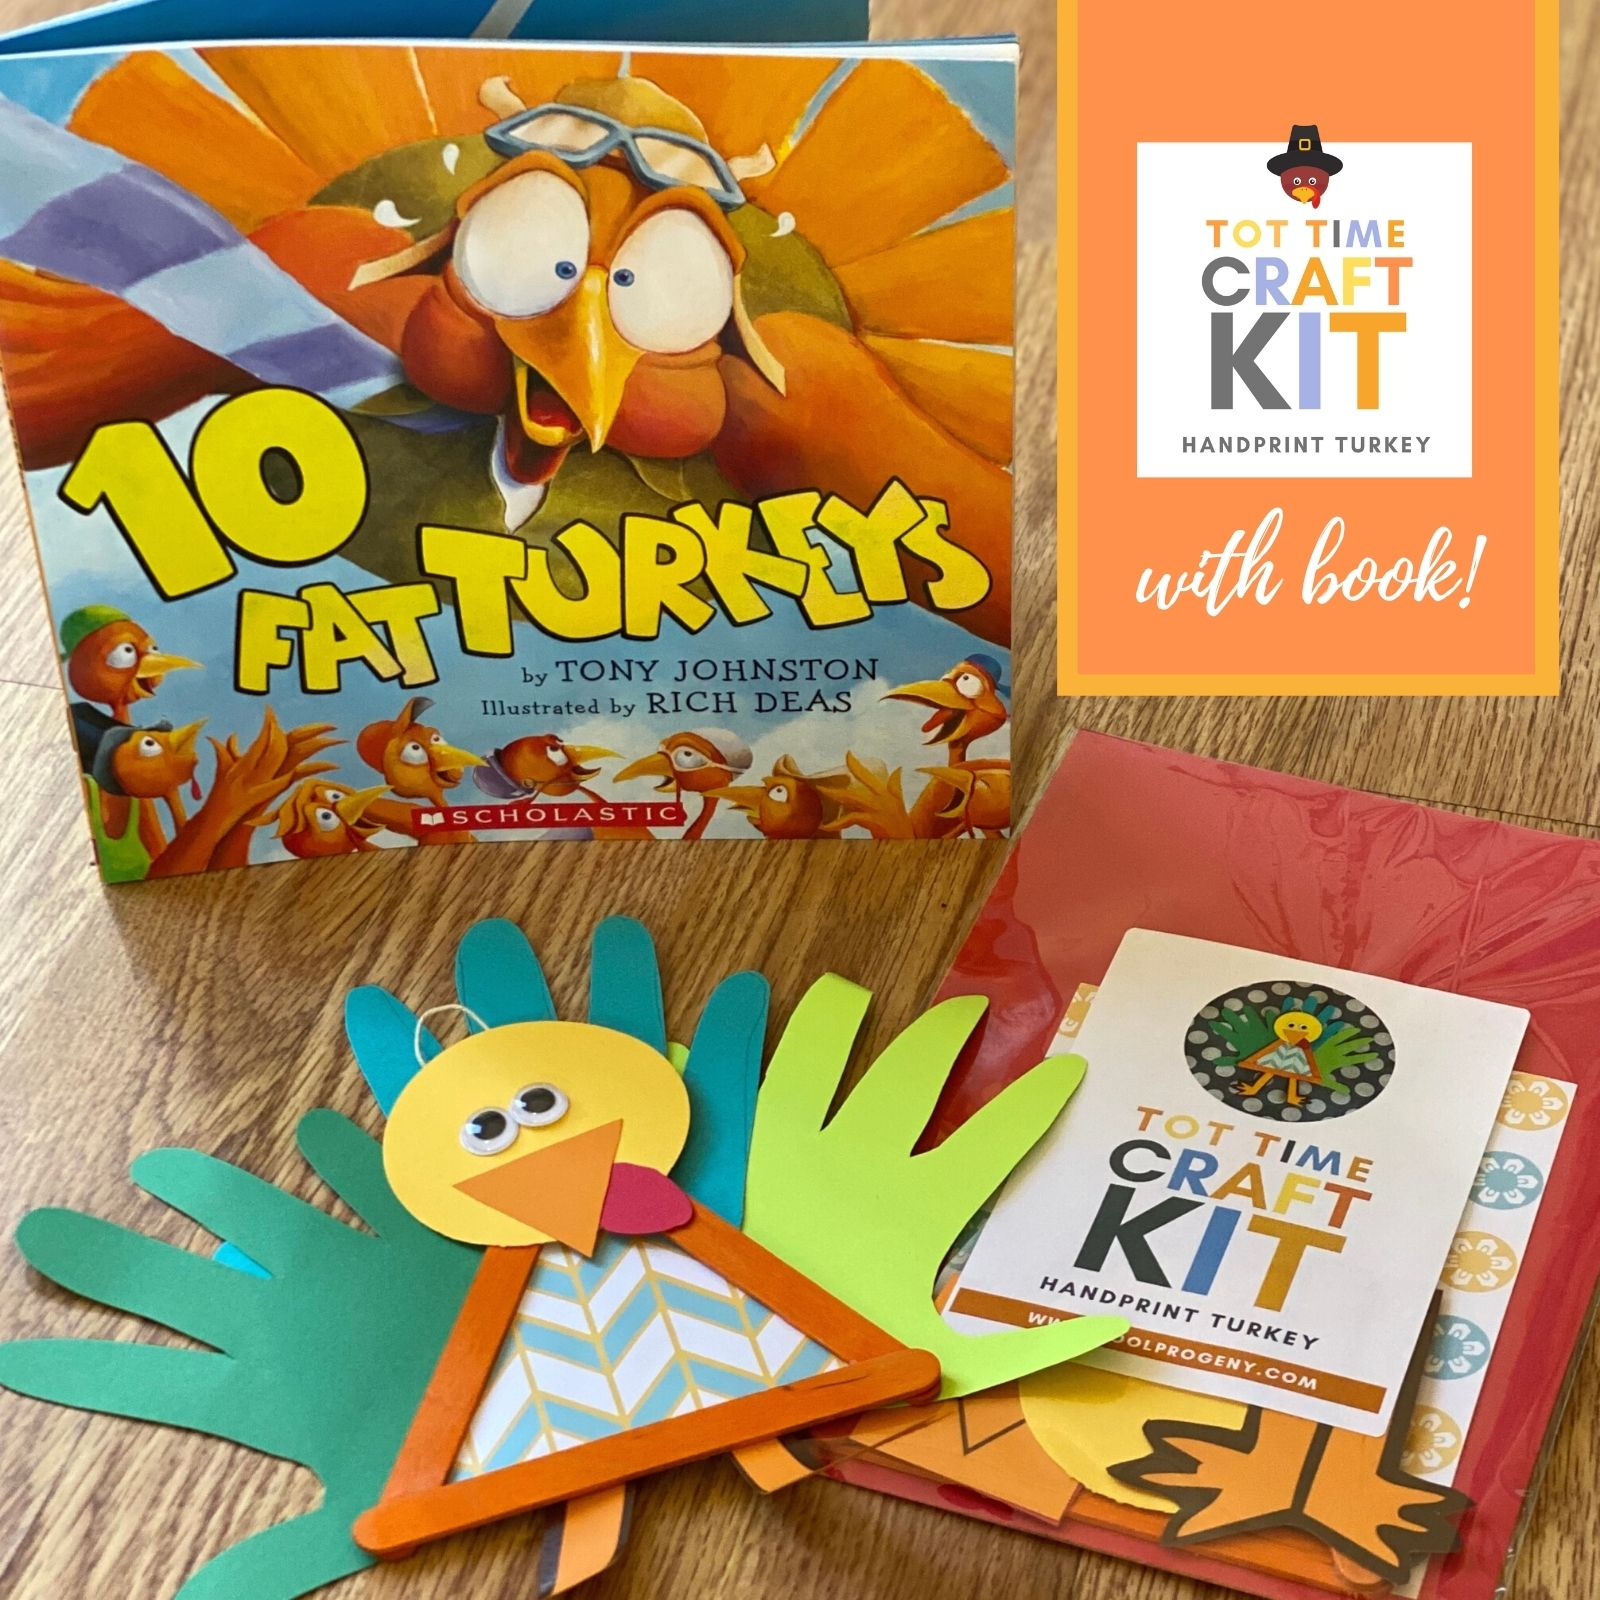 Craft and Book Kit - Turkey